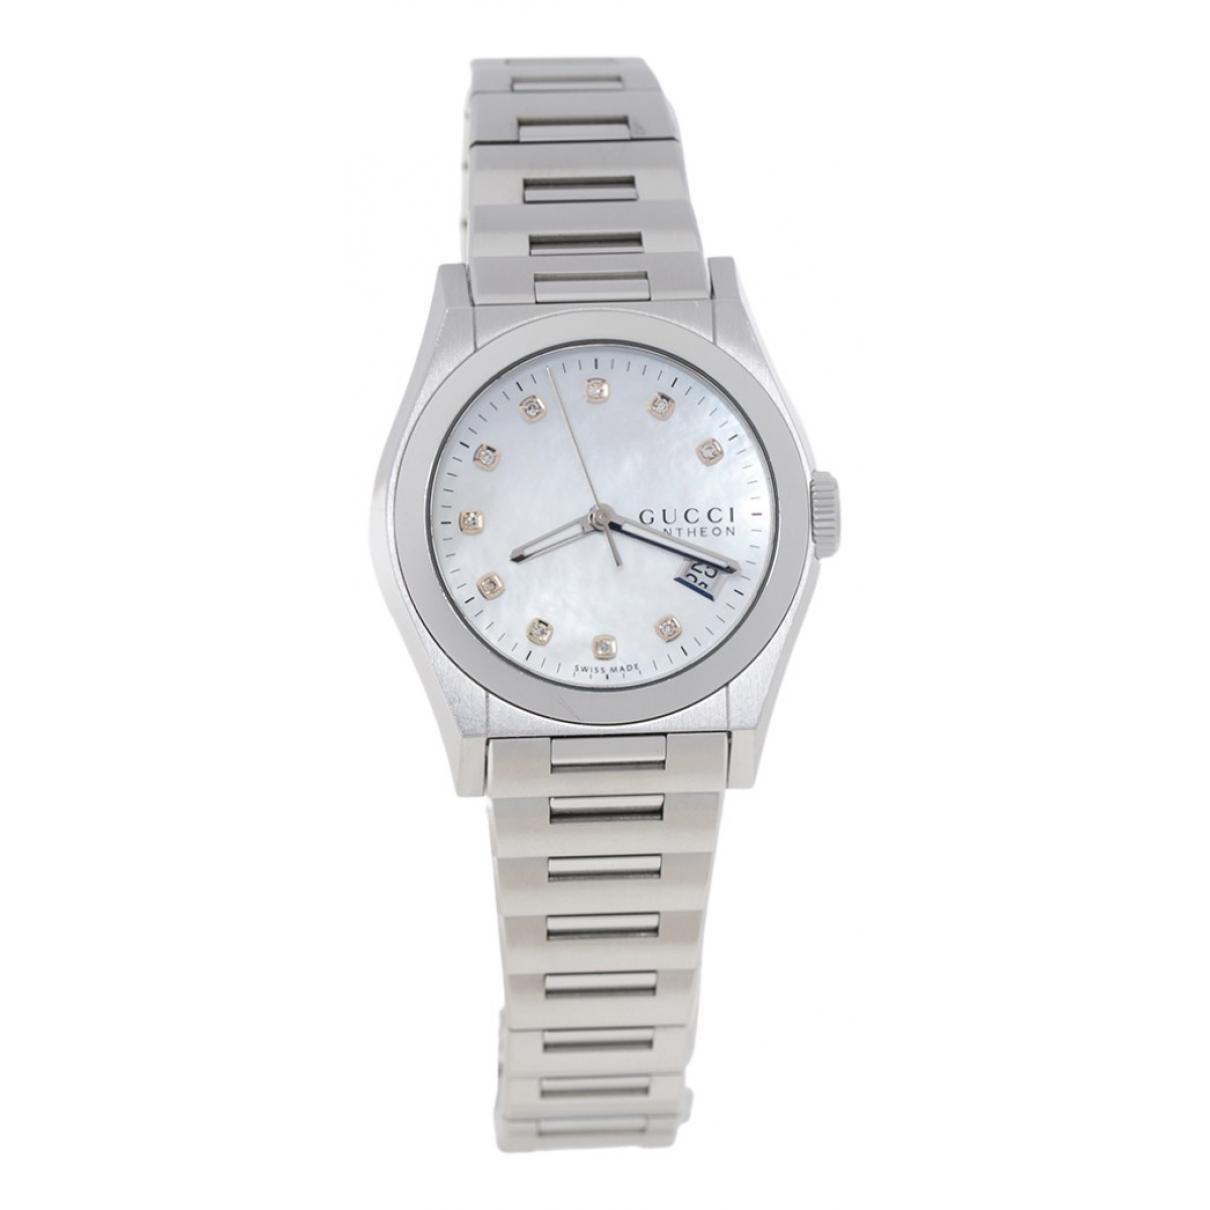 Gucci Pantheon Uhr in  Silber Stahl